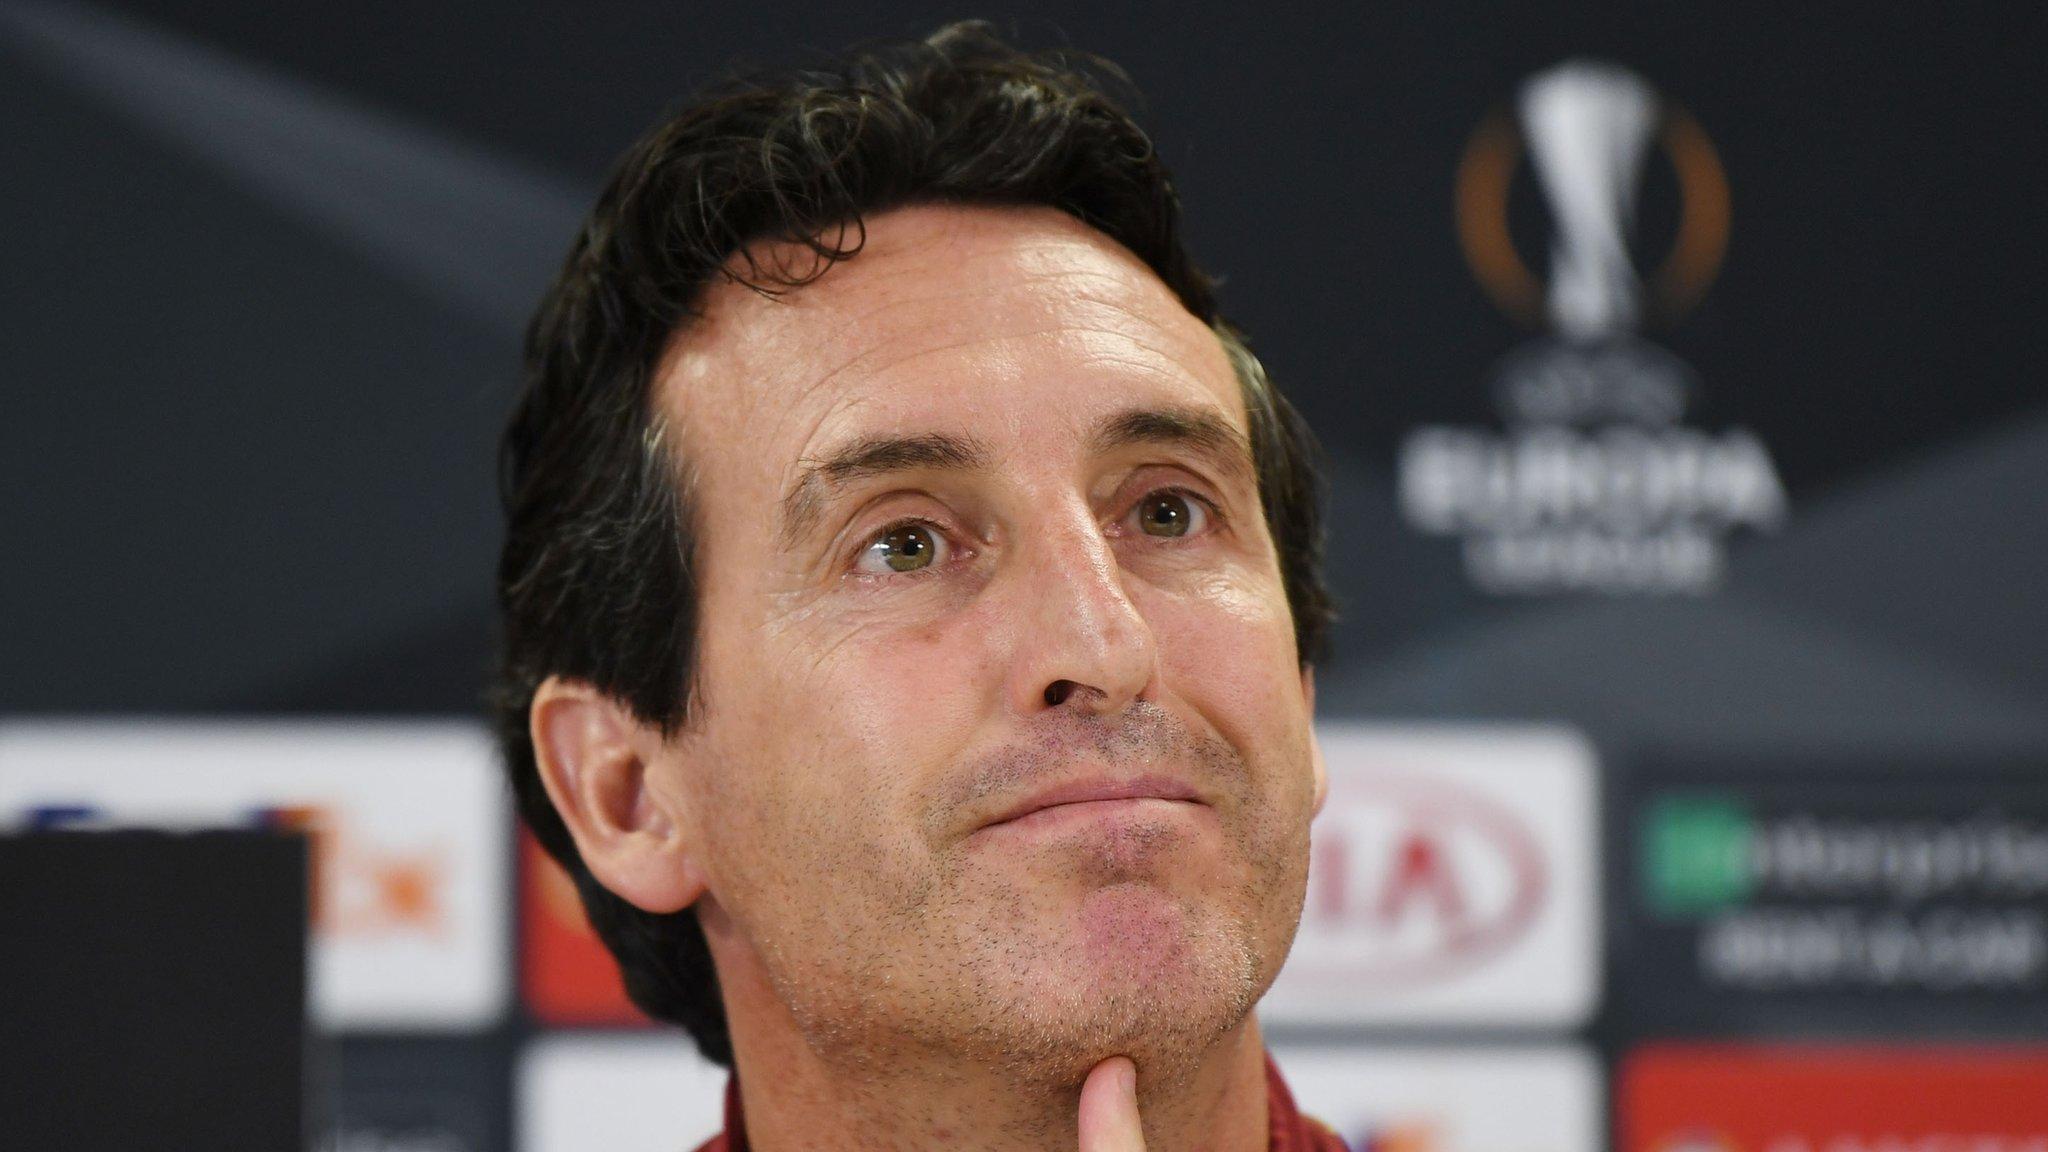 Premier League tops Arsenal priority list - Emery